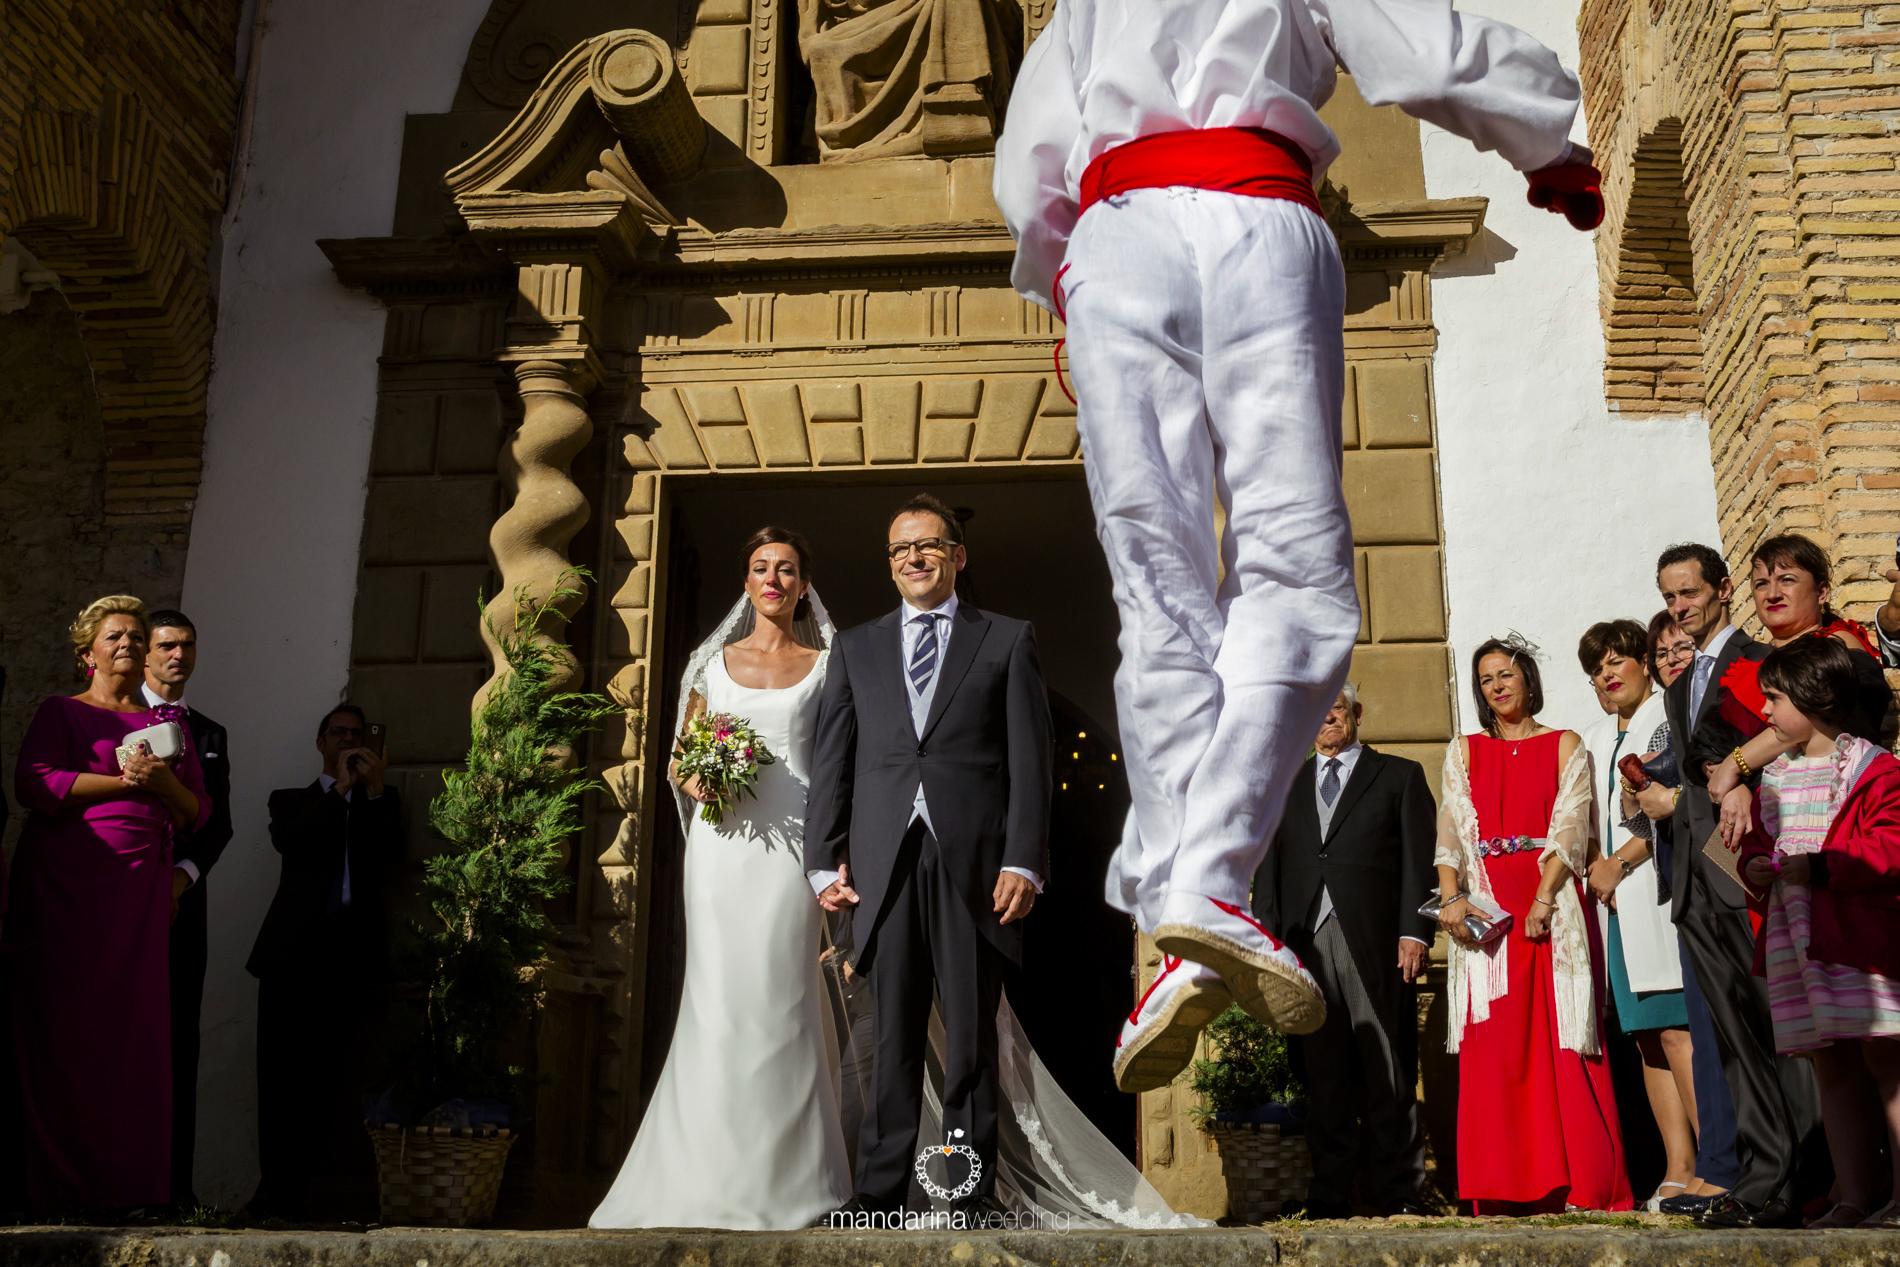 mandaria wedding, fotografos de boda, fotoperiodismo de boda, mejores fotografos de boda, bodas soria, bodas pirineo, bodas Madrid, fotógrafos tarragona_29